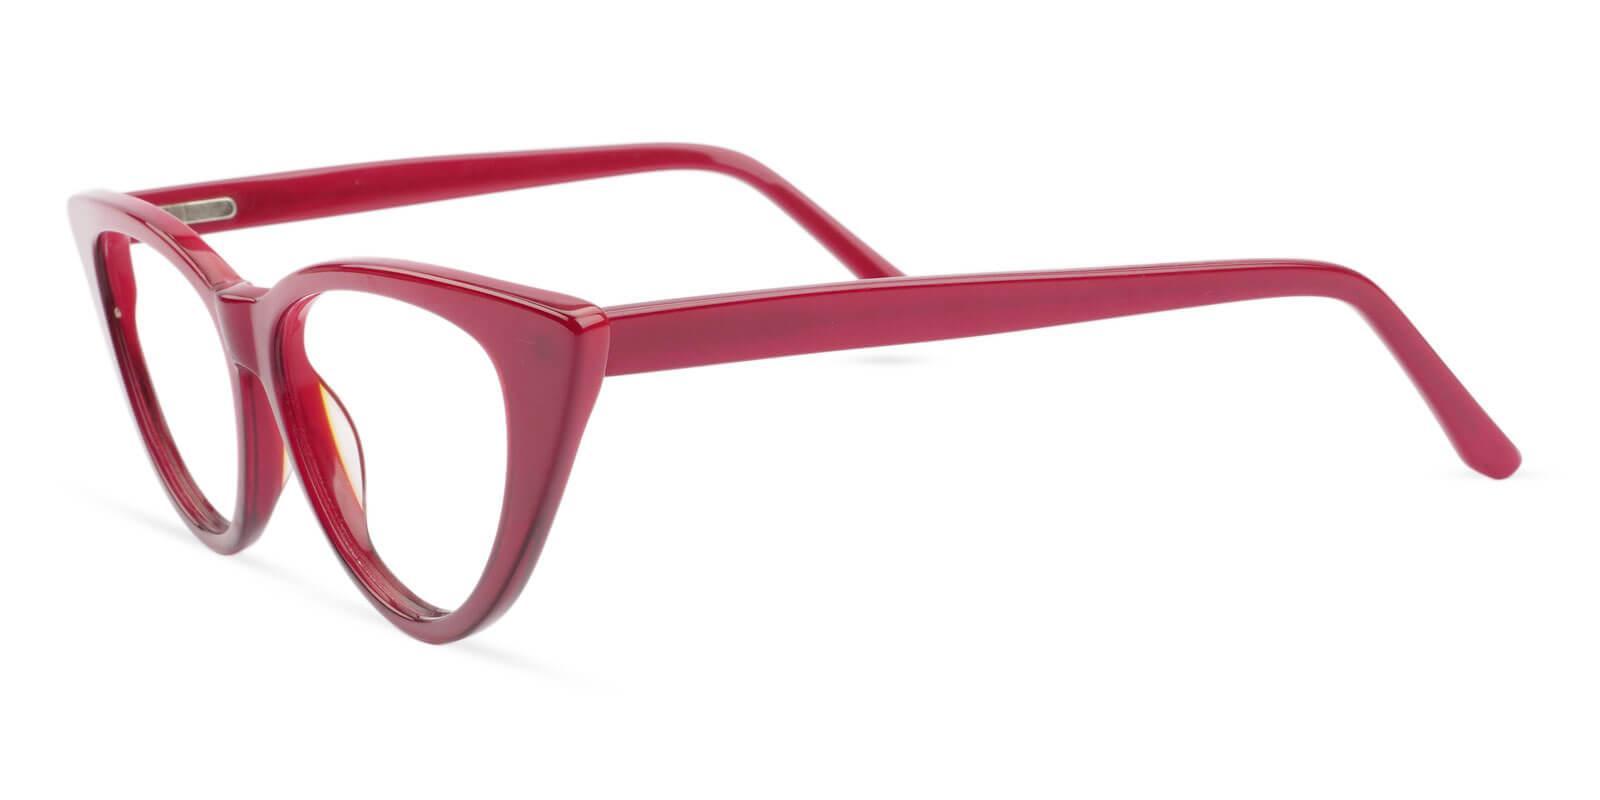 Nora Red Acetate Eyeglasses , SpringHinges , UniversalBridgeFit Frames from ABBE Glasses